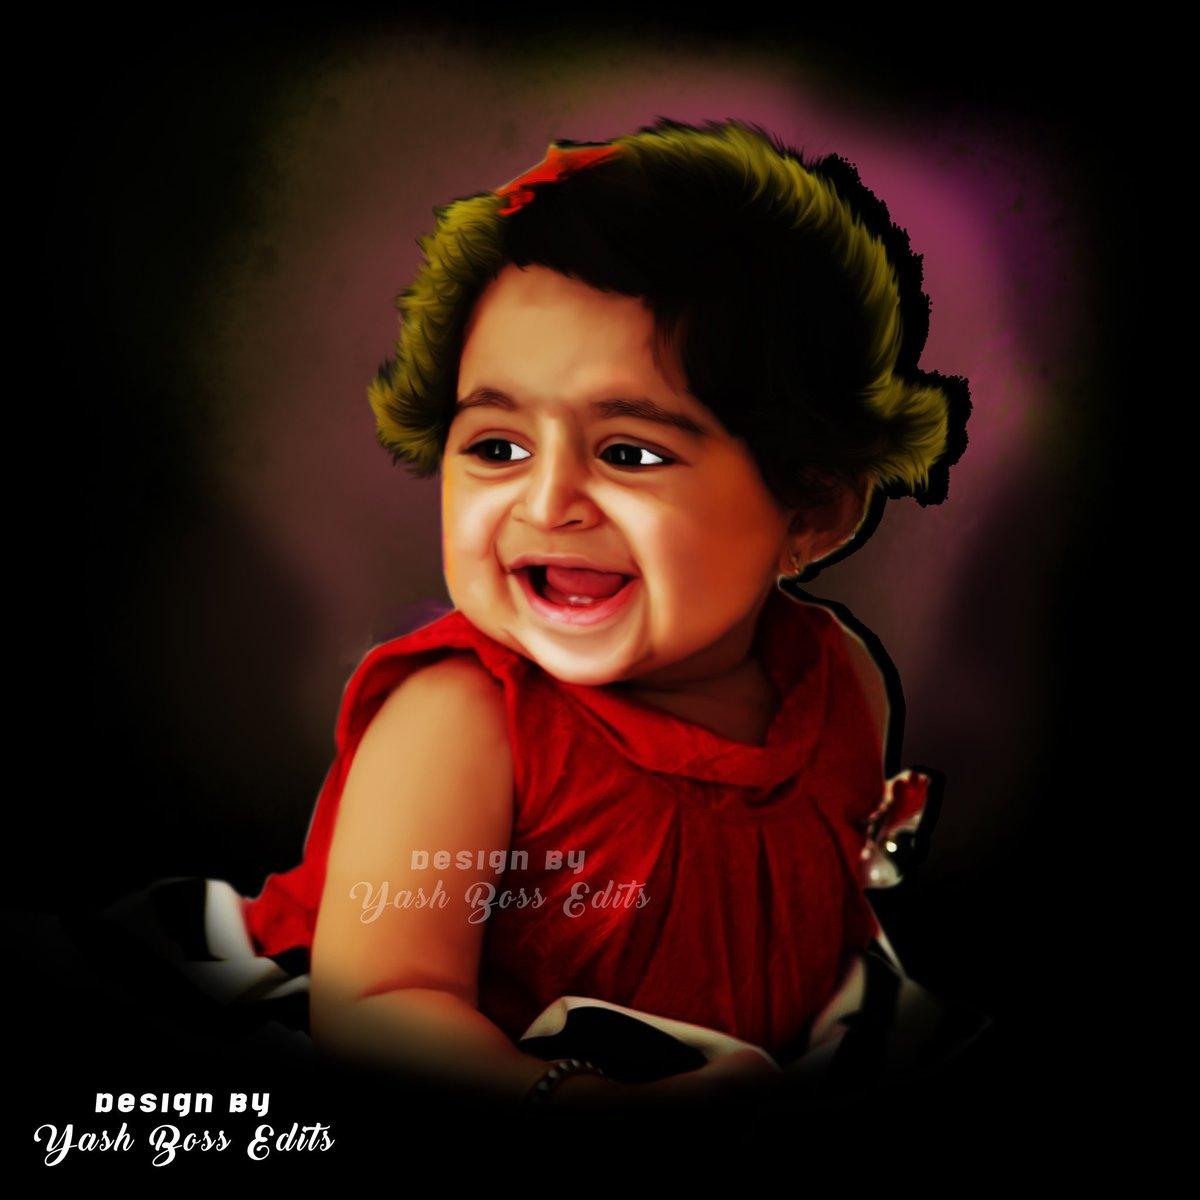 AyraYash    Cutest Pic Design By @YashBossEdits   #AyraYash   @TheNameIsYash @RadhikaPandit7 @AyraYashFcpic.twitter.com/AgOws3XHzw